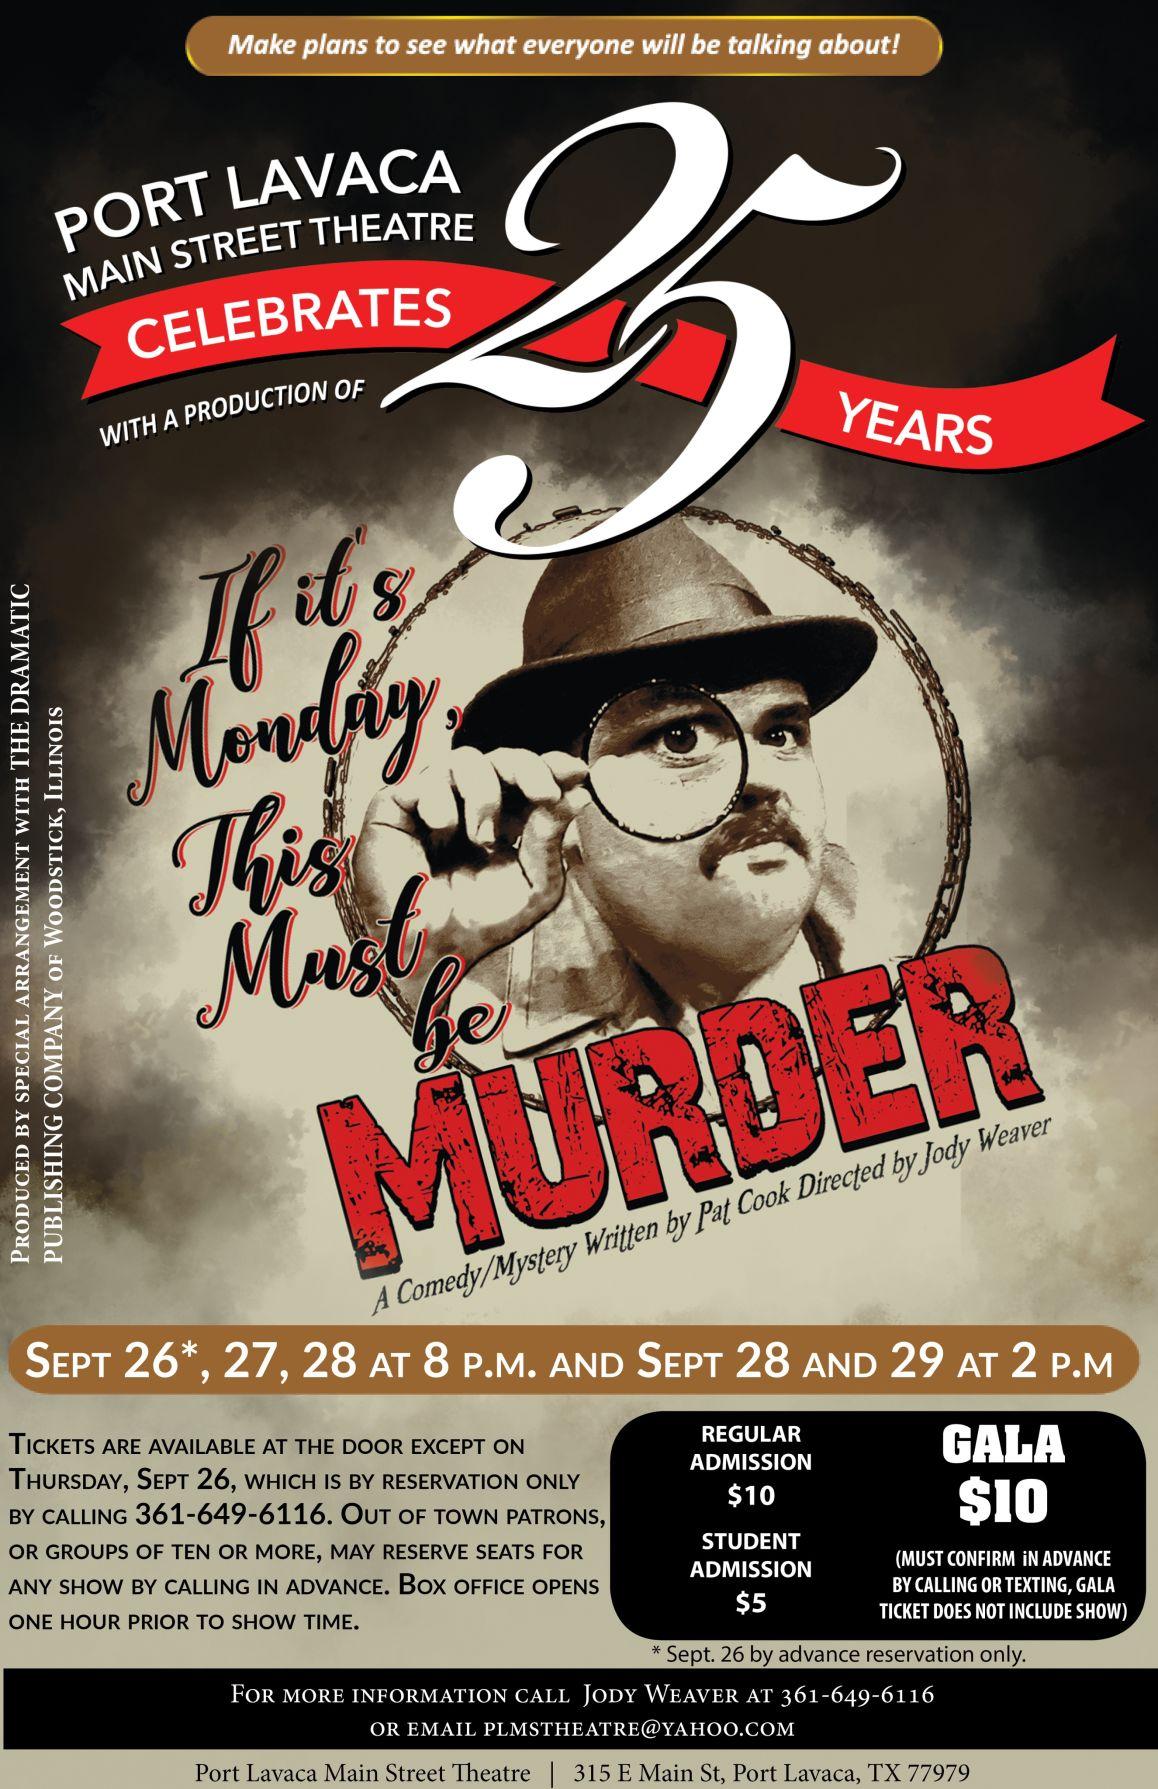 Port Lavaca Main Street Theatre celebrating 25 years